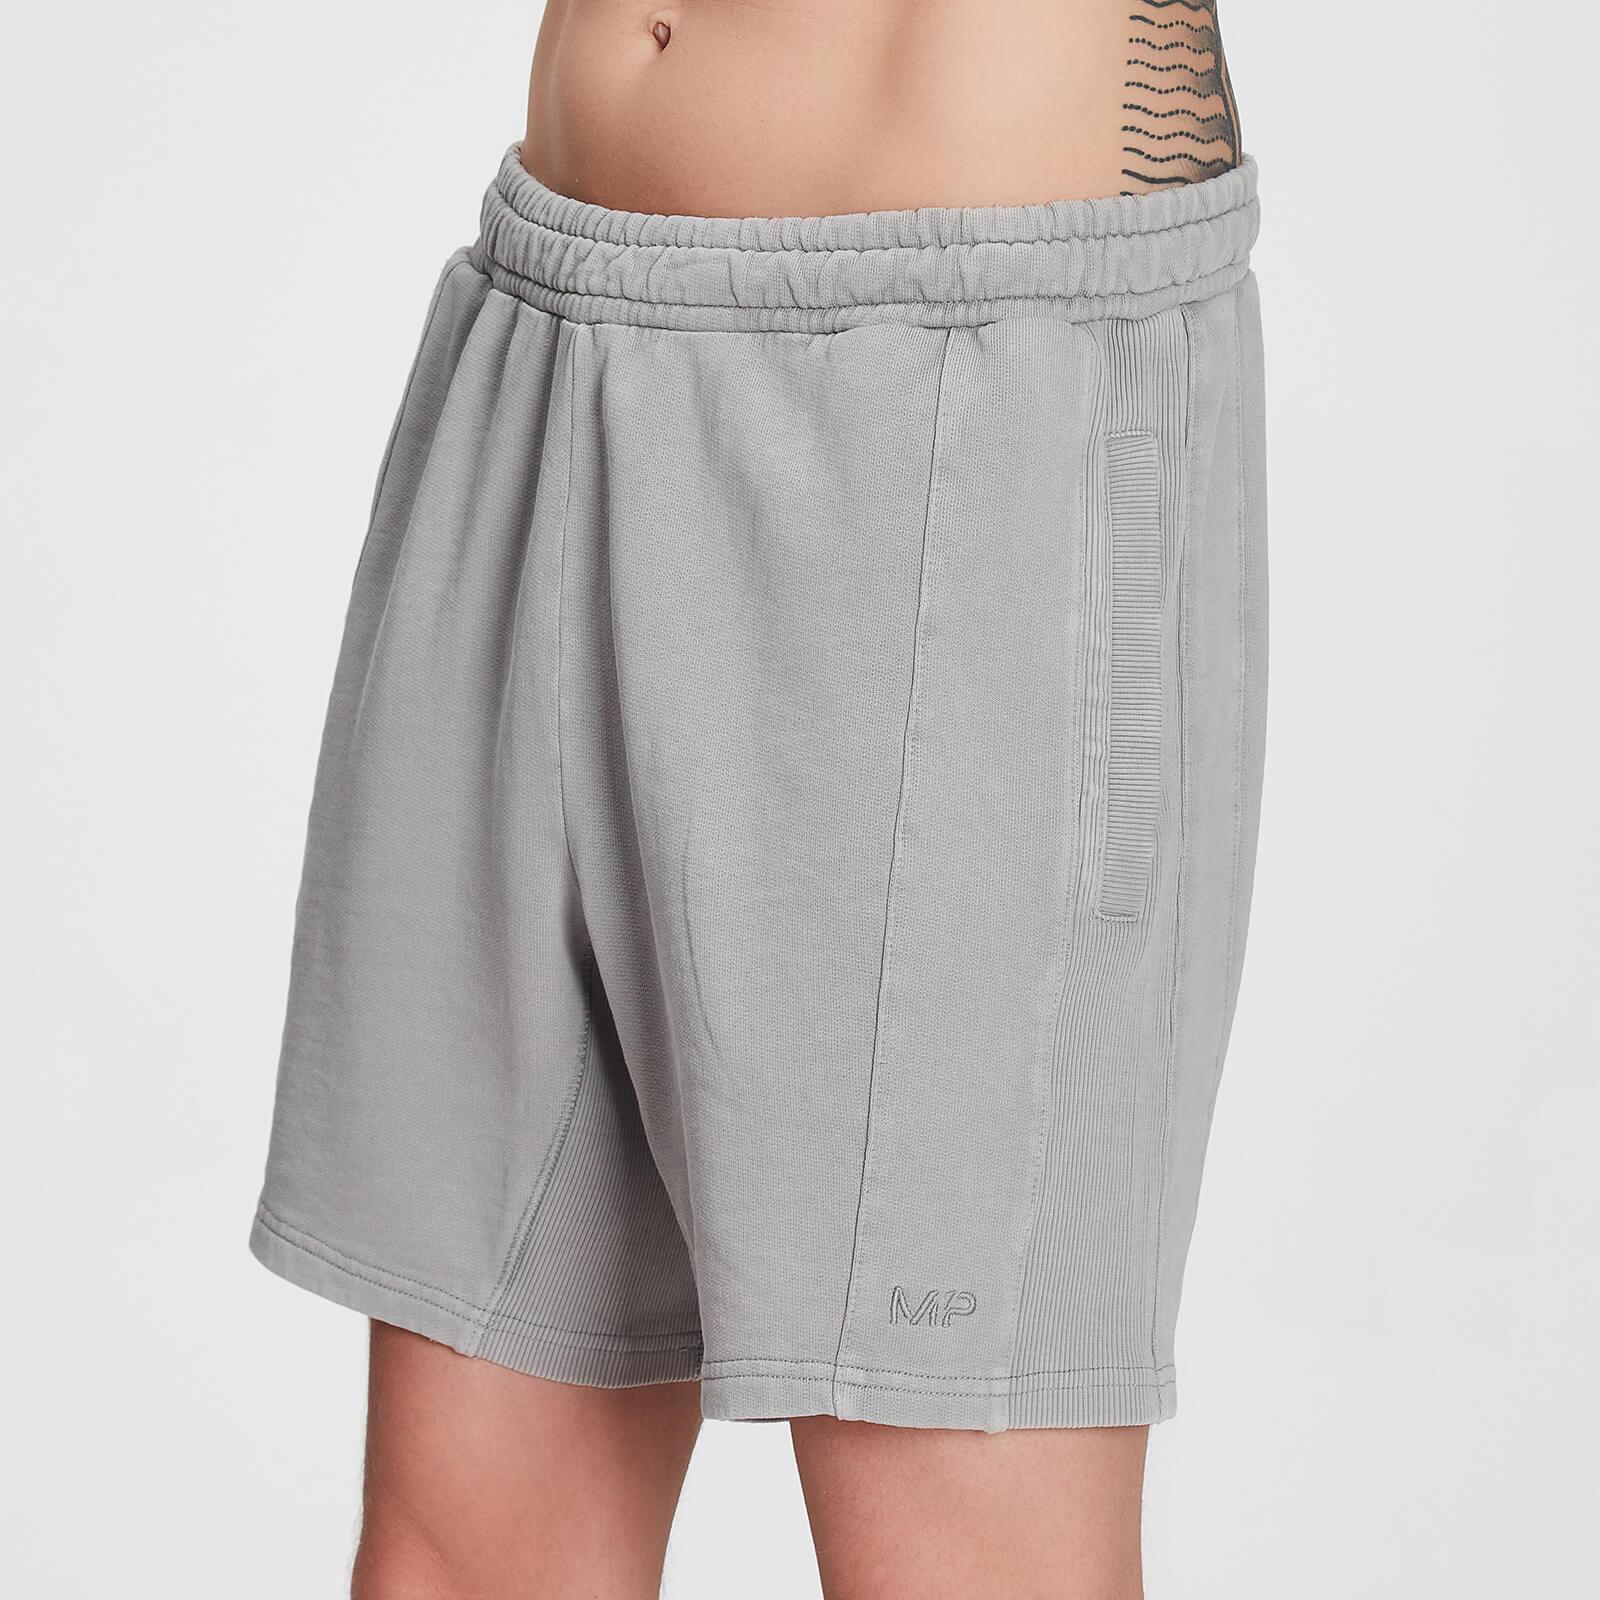 Купить MP Men's Raw Training Shorts - Storm - XS, Myprotein International